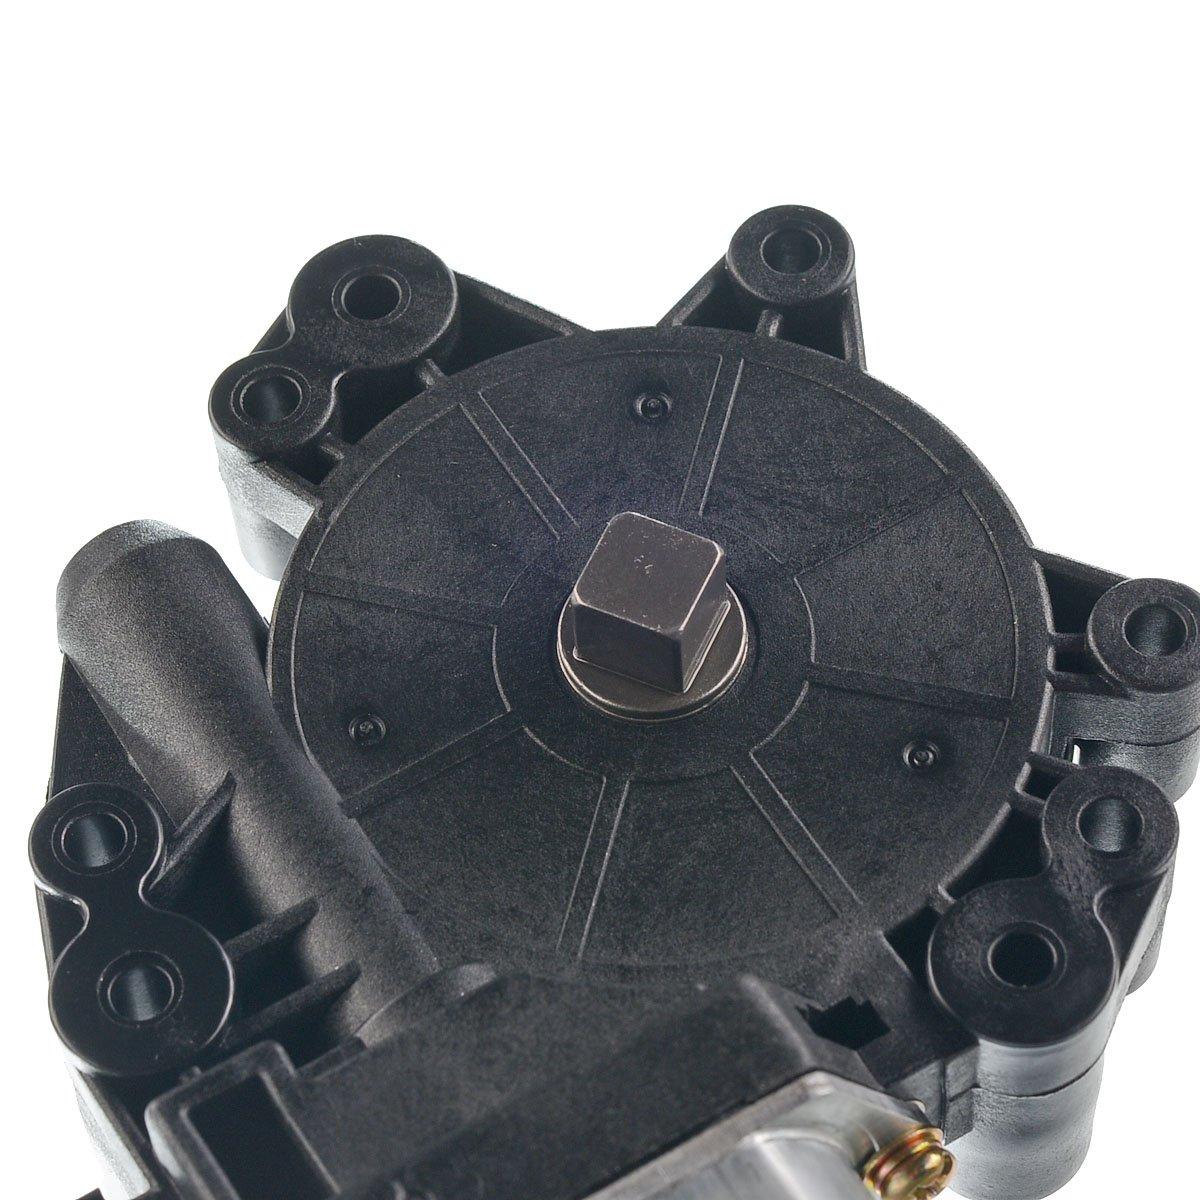 A-Premium Power Window Lift Motor for Nissan Titan 2004-2011 Armada Maxima Rear Left and Right 2-PC Set